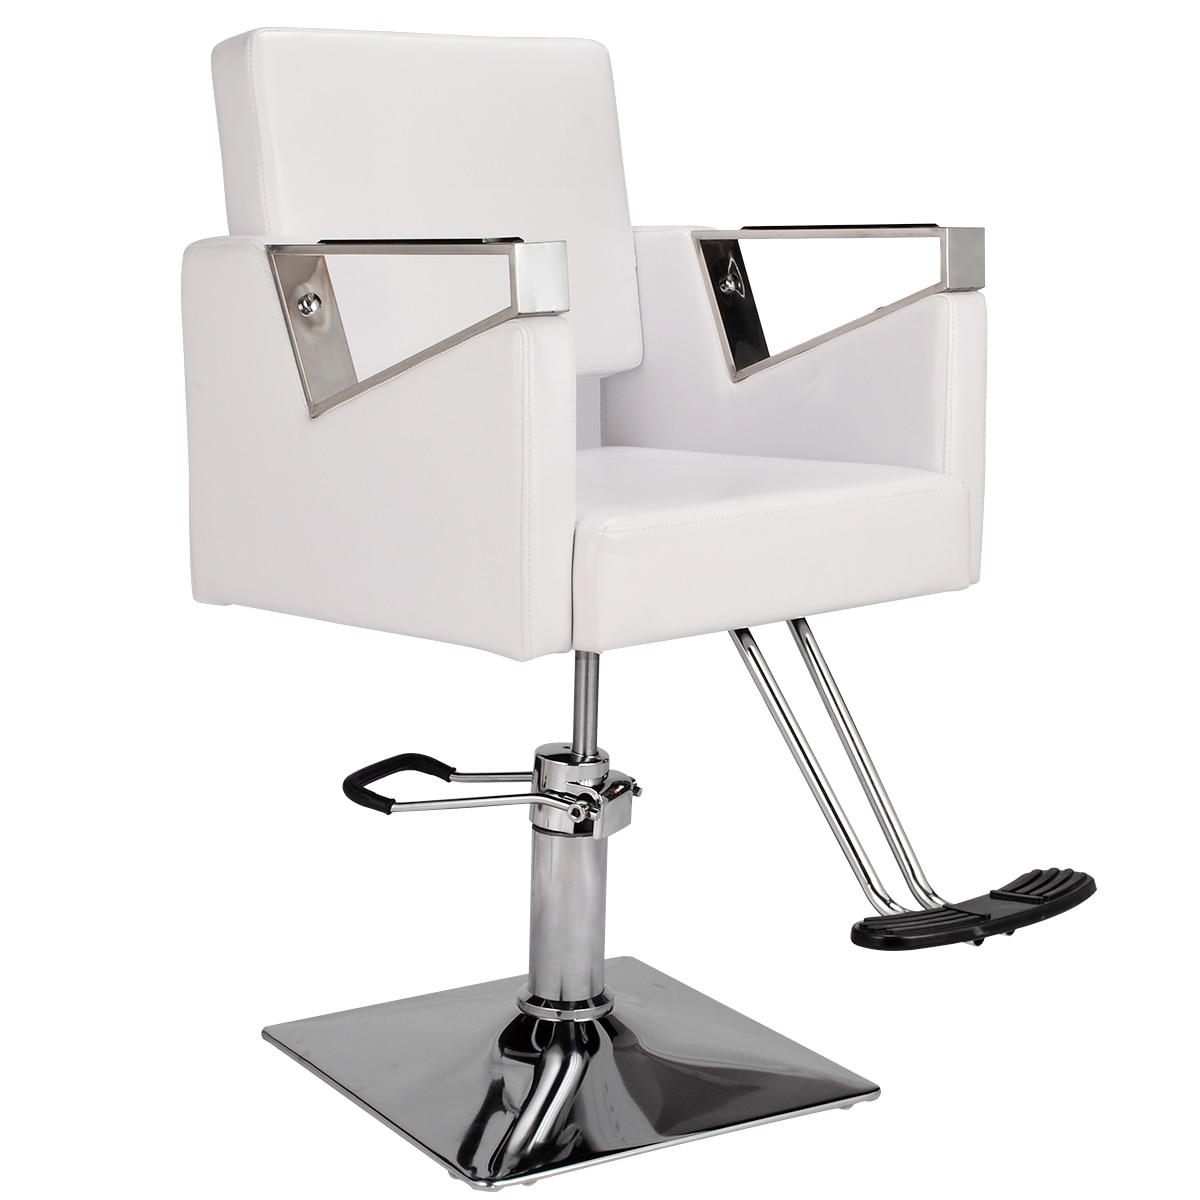 White Hairdressing Chair Hydraulic Rotary PU Leather Barber's Chair Barbershop Chair Hair Cut Salon Furniture